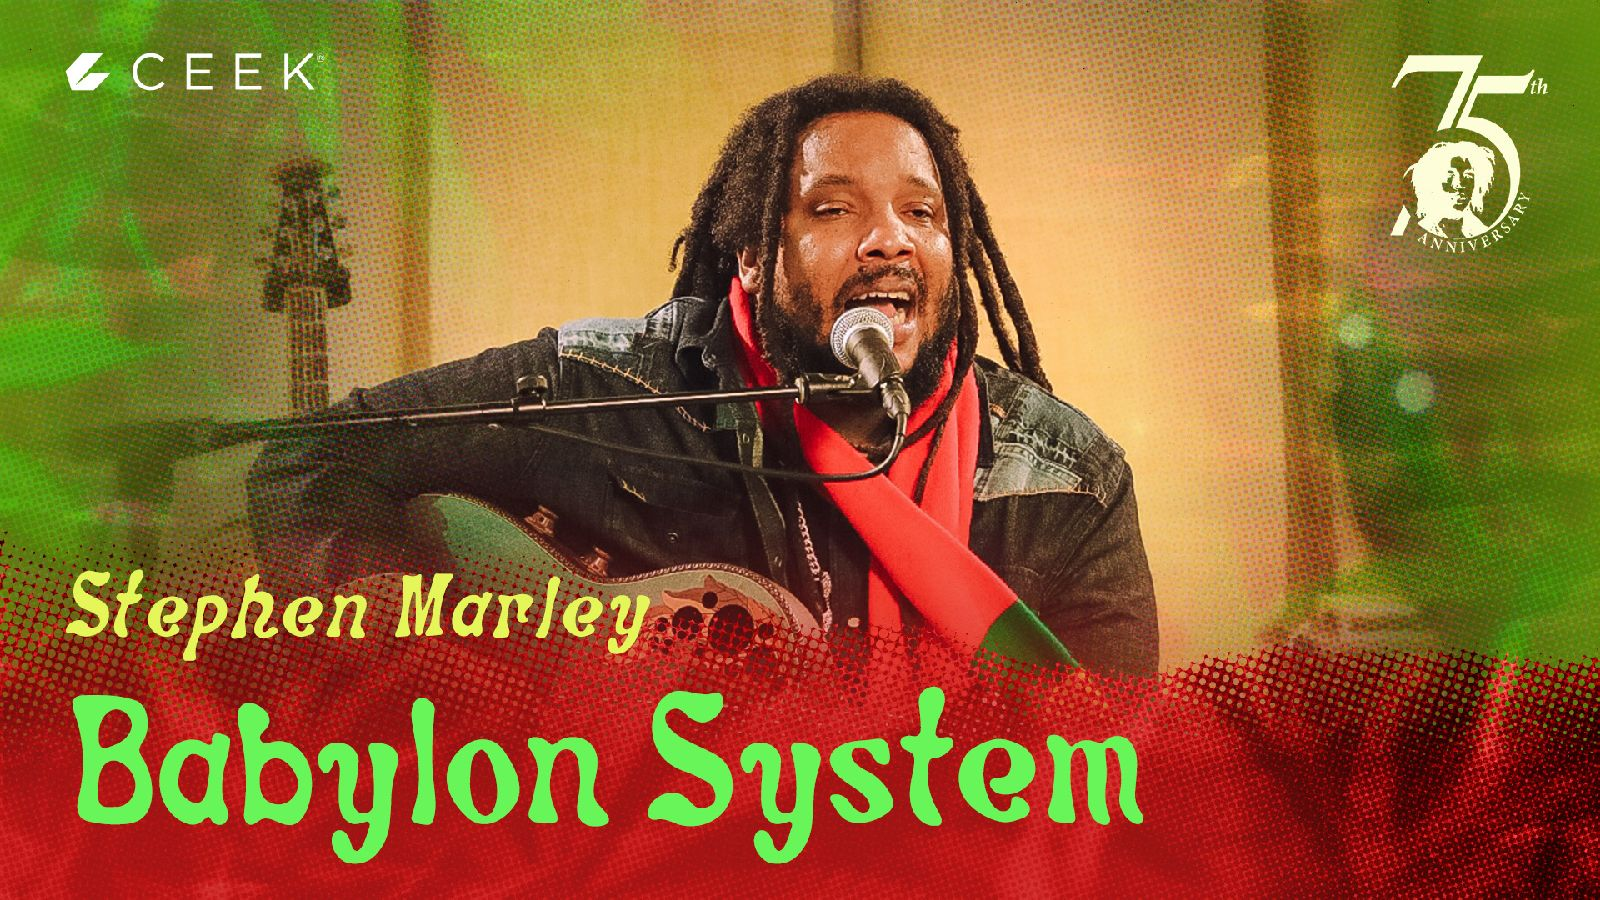 Babylon System ceek.com